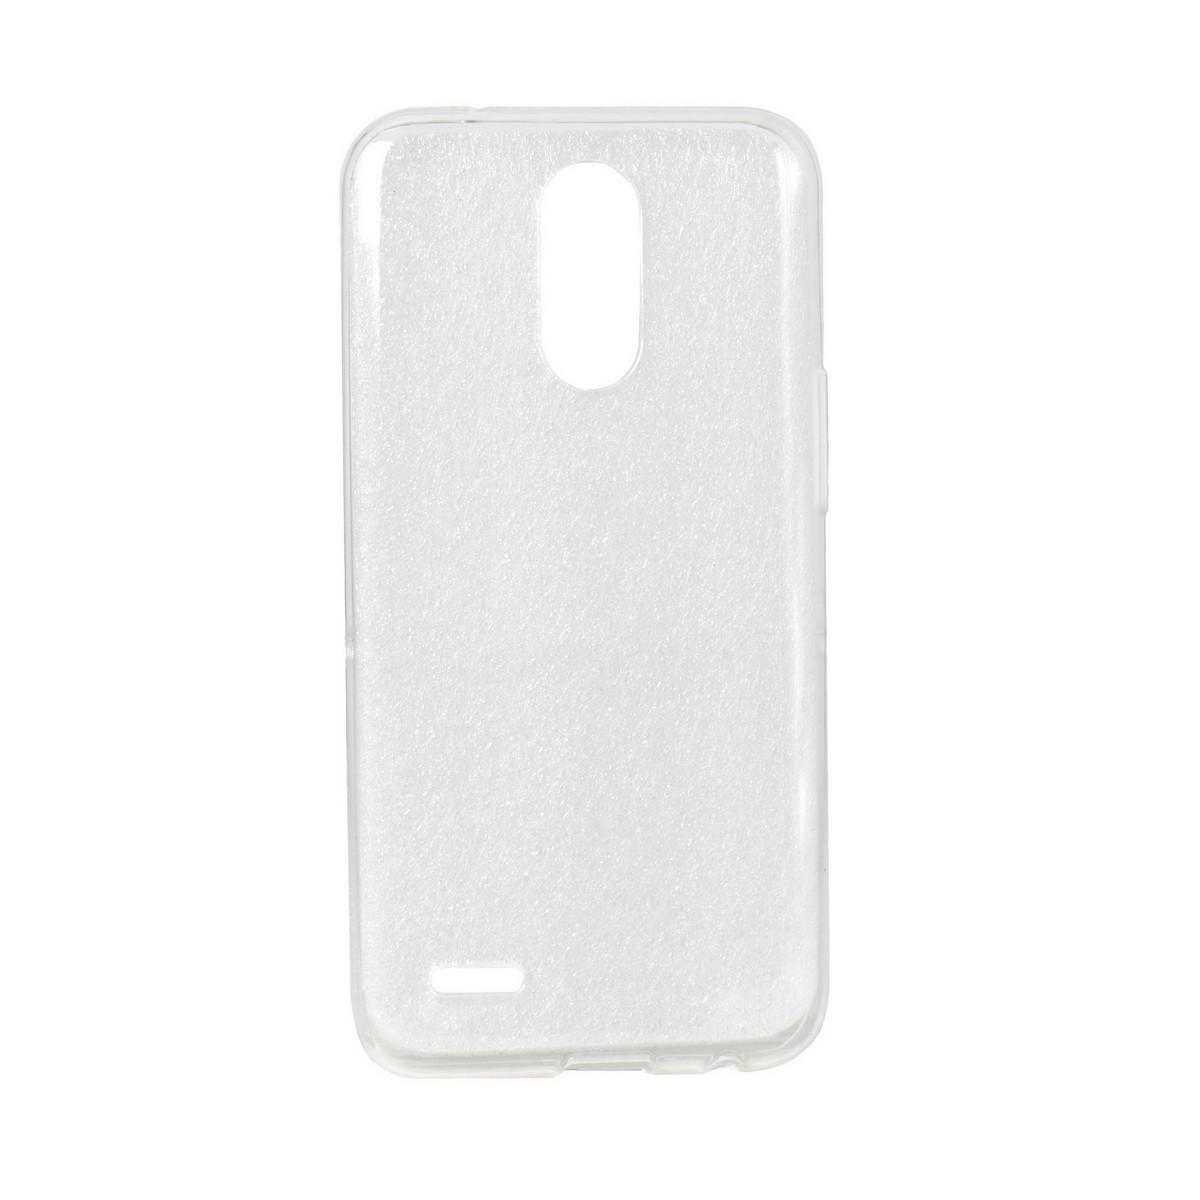 Чехол для LG K10 (2017) back cover ultra-thin gel AAA clear